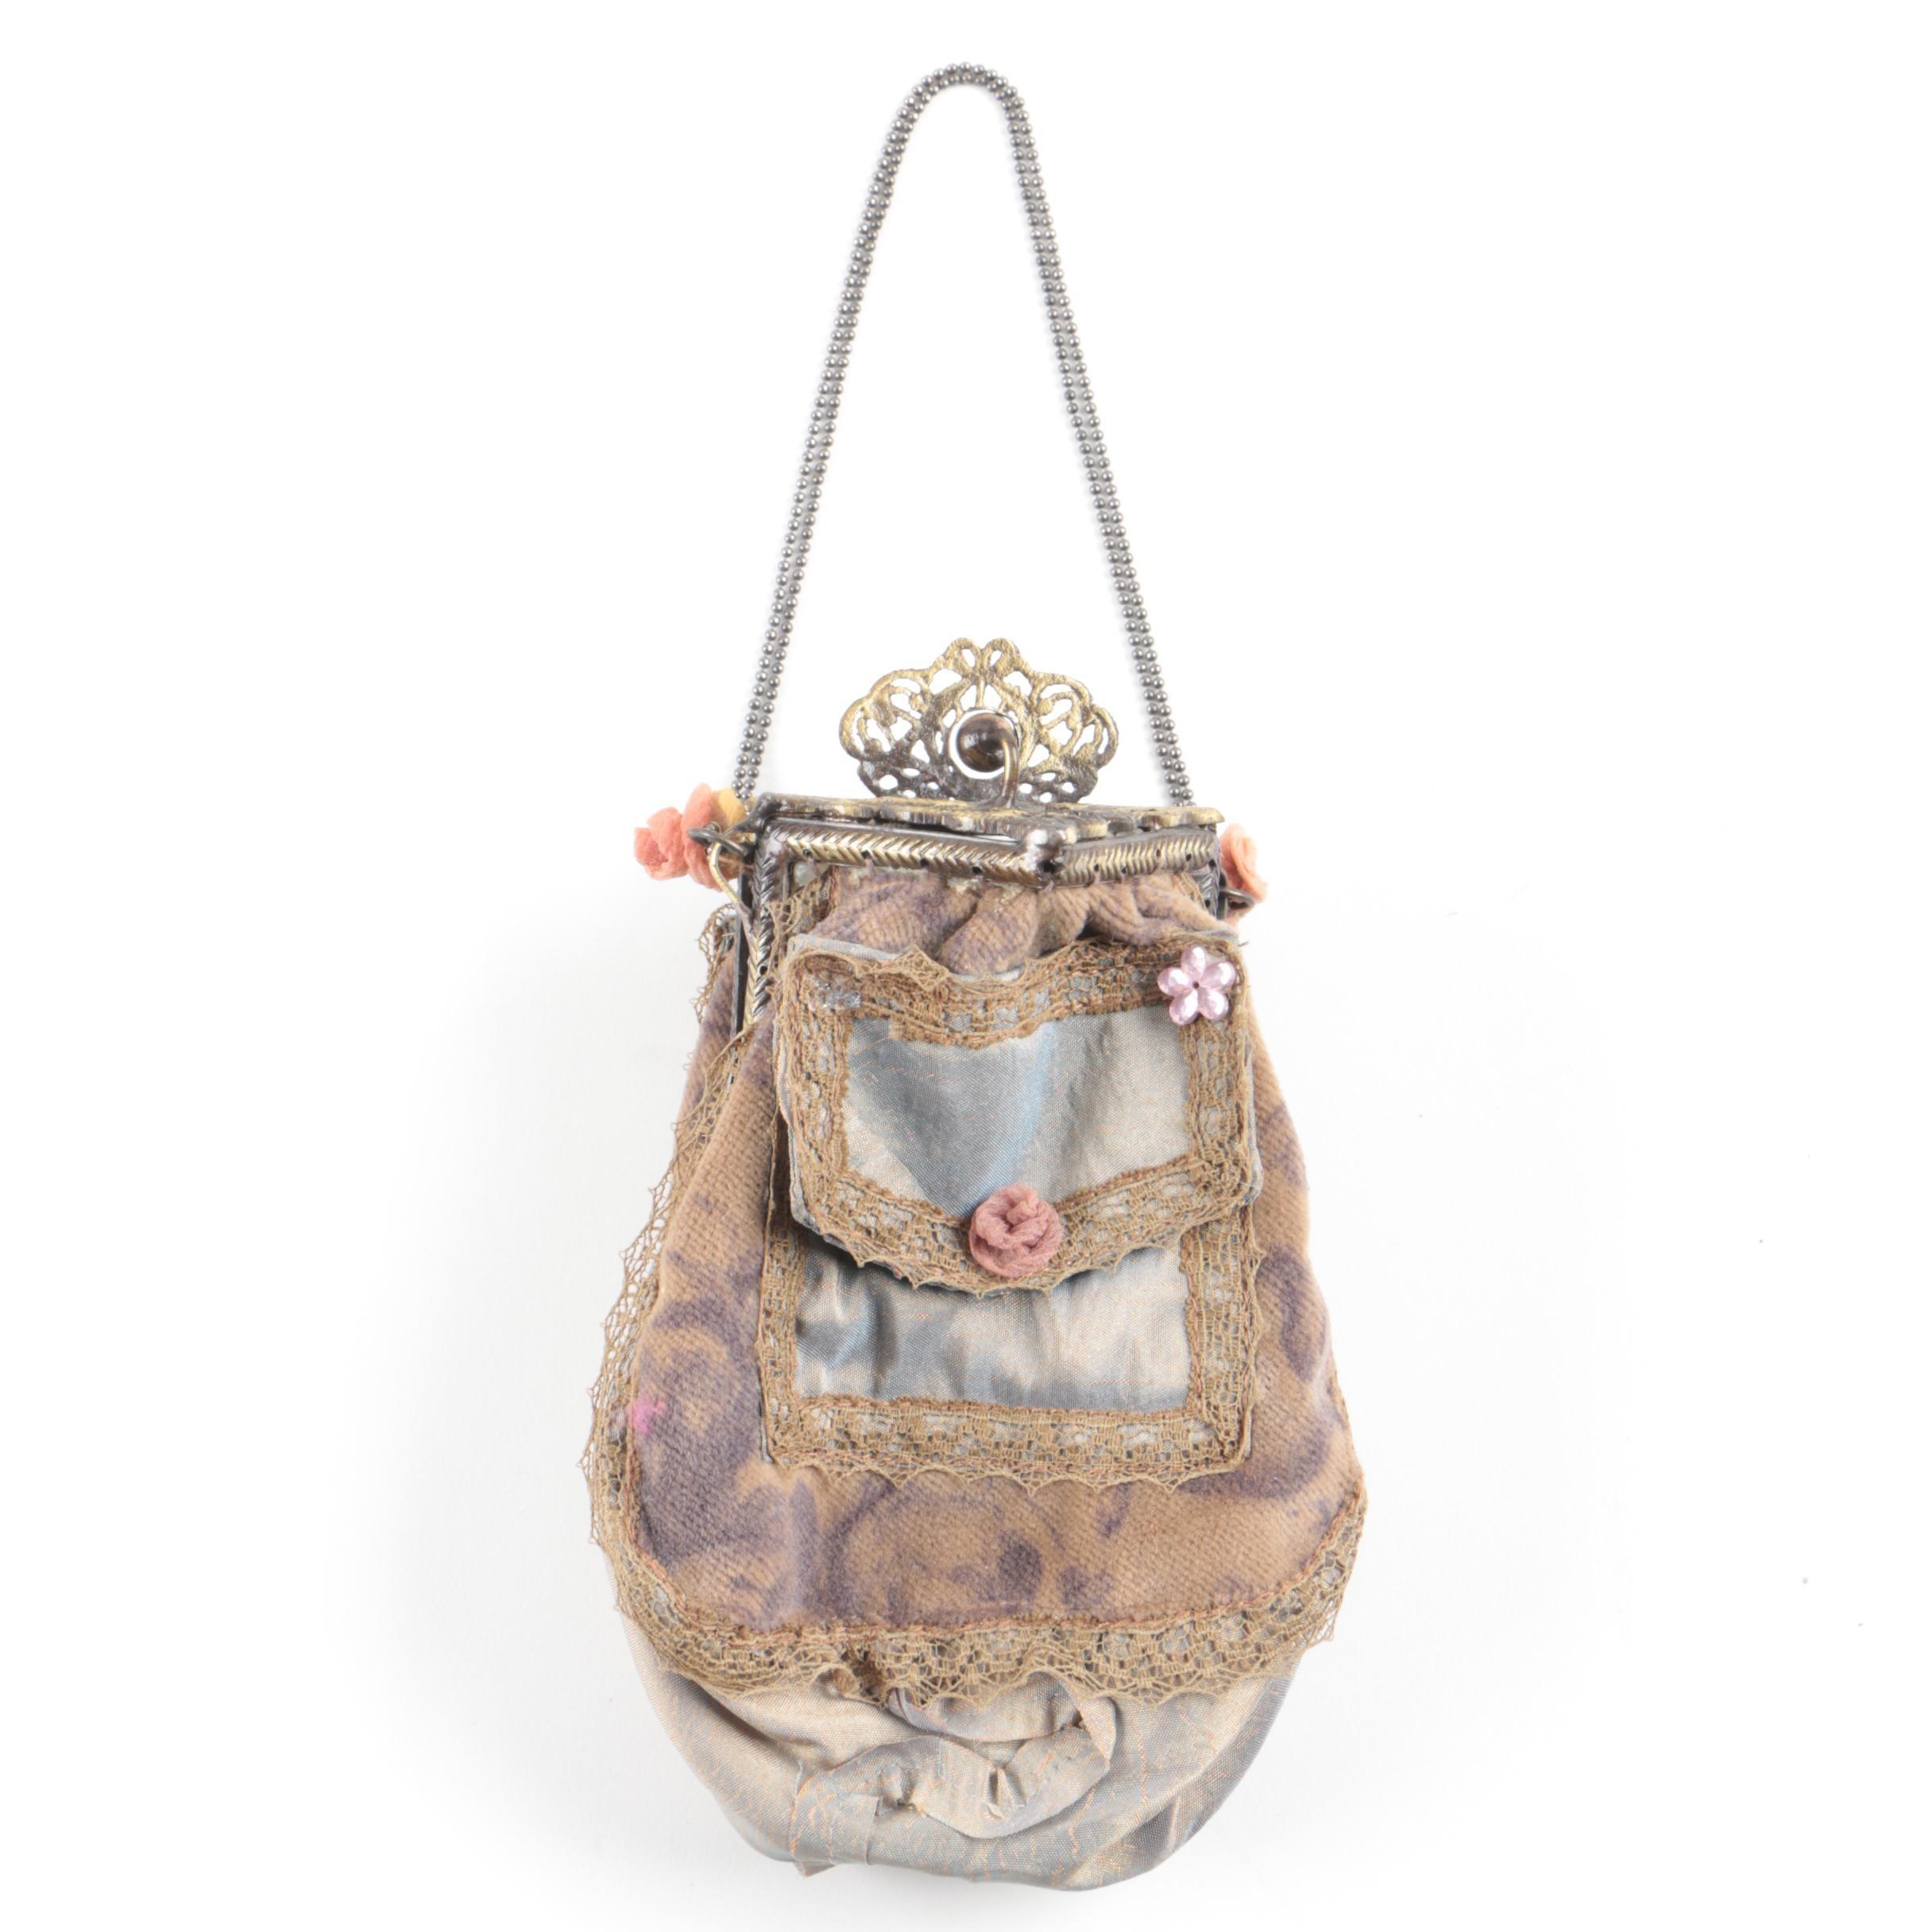 Handmade Mixed Media Occasion Frame Handbag